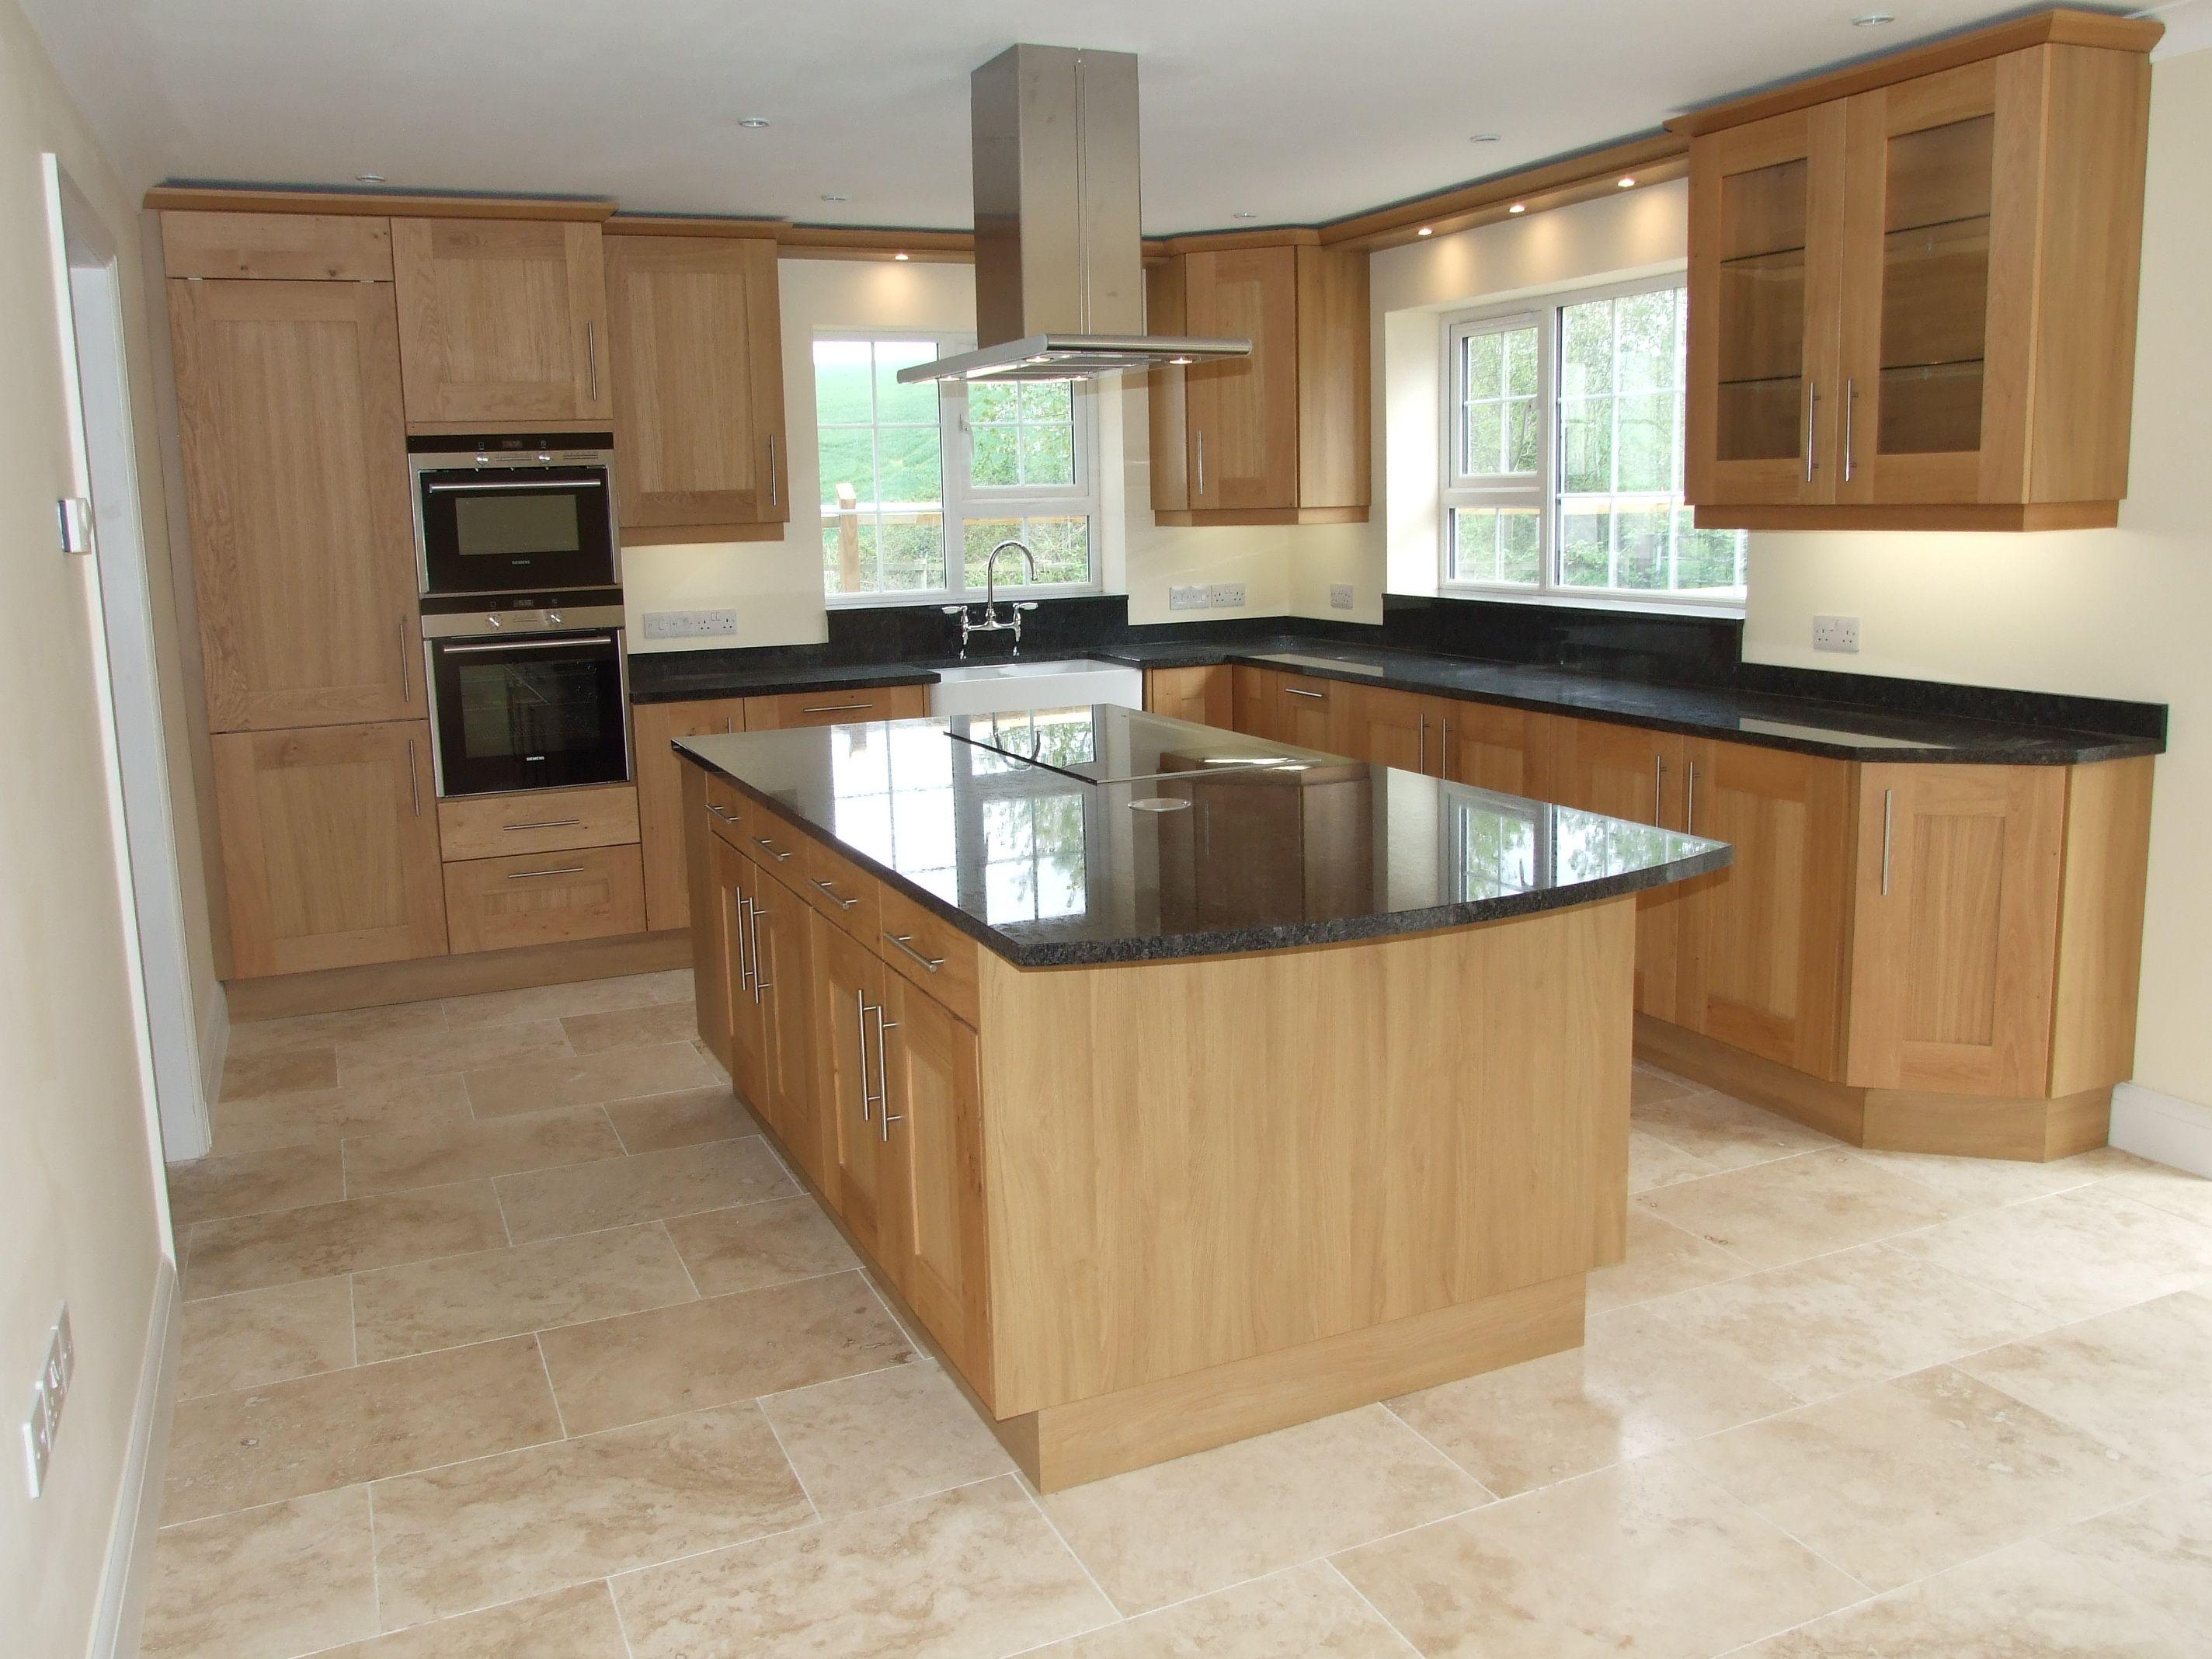 design home fold interior stylish with kitchen doors on bi